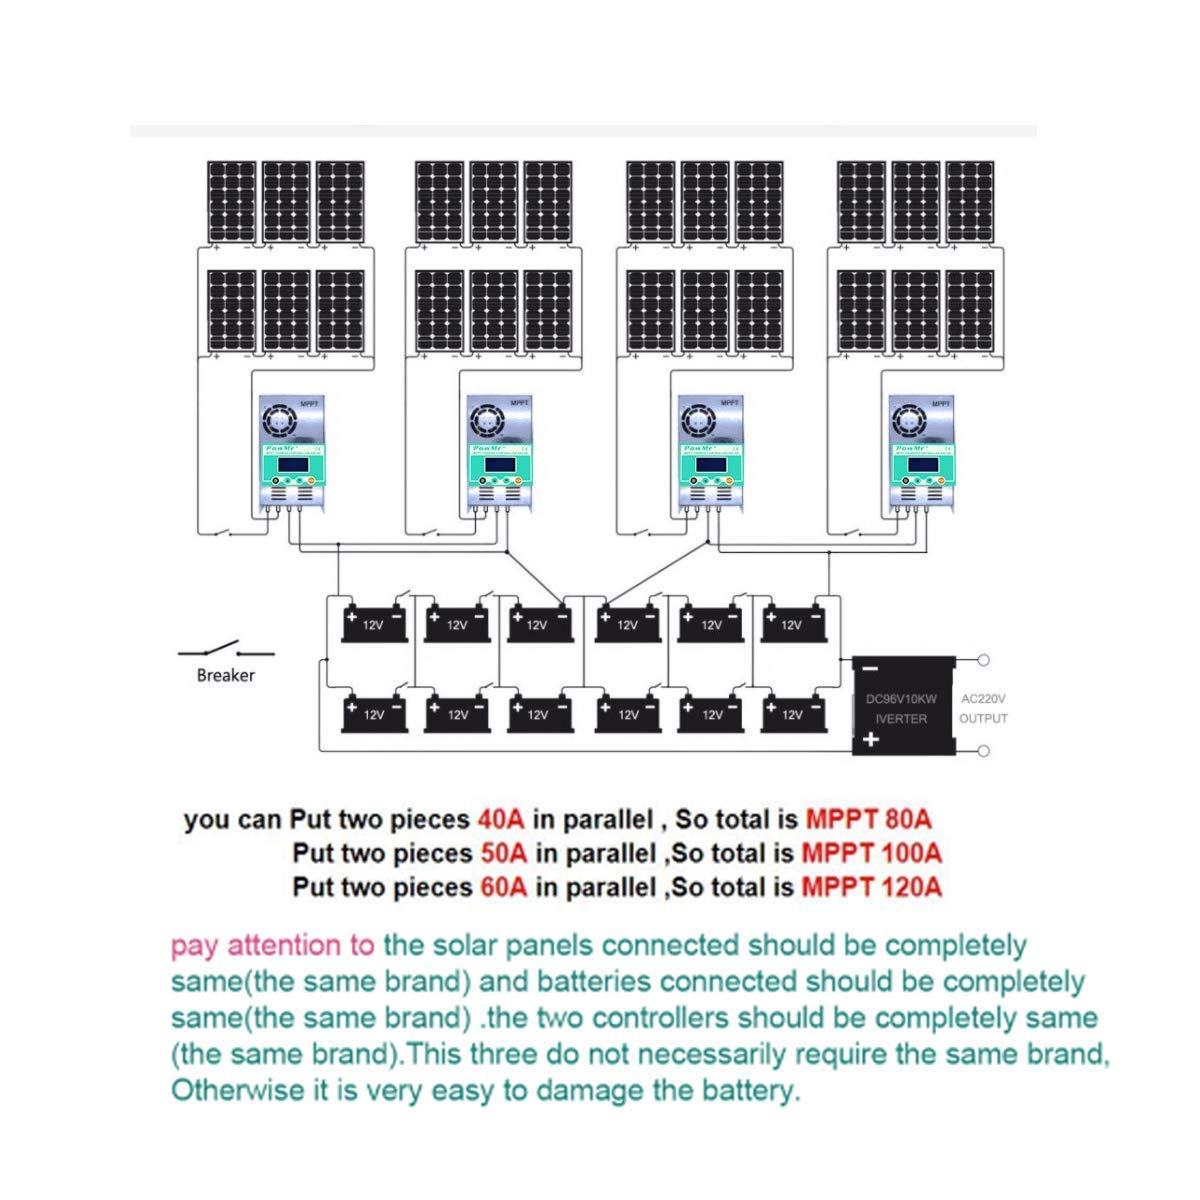 PowMr MPPT 30A Solar Charge Controller 48V 36V 24V 12V Auto Max 190VDC Input Solar Regulator for Vented Sealed Gel NiCd Lithium Battery with Backlight LCD【Software Update Version】